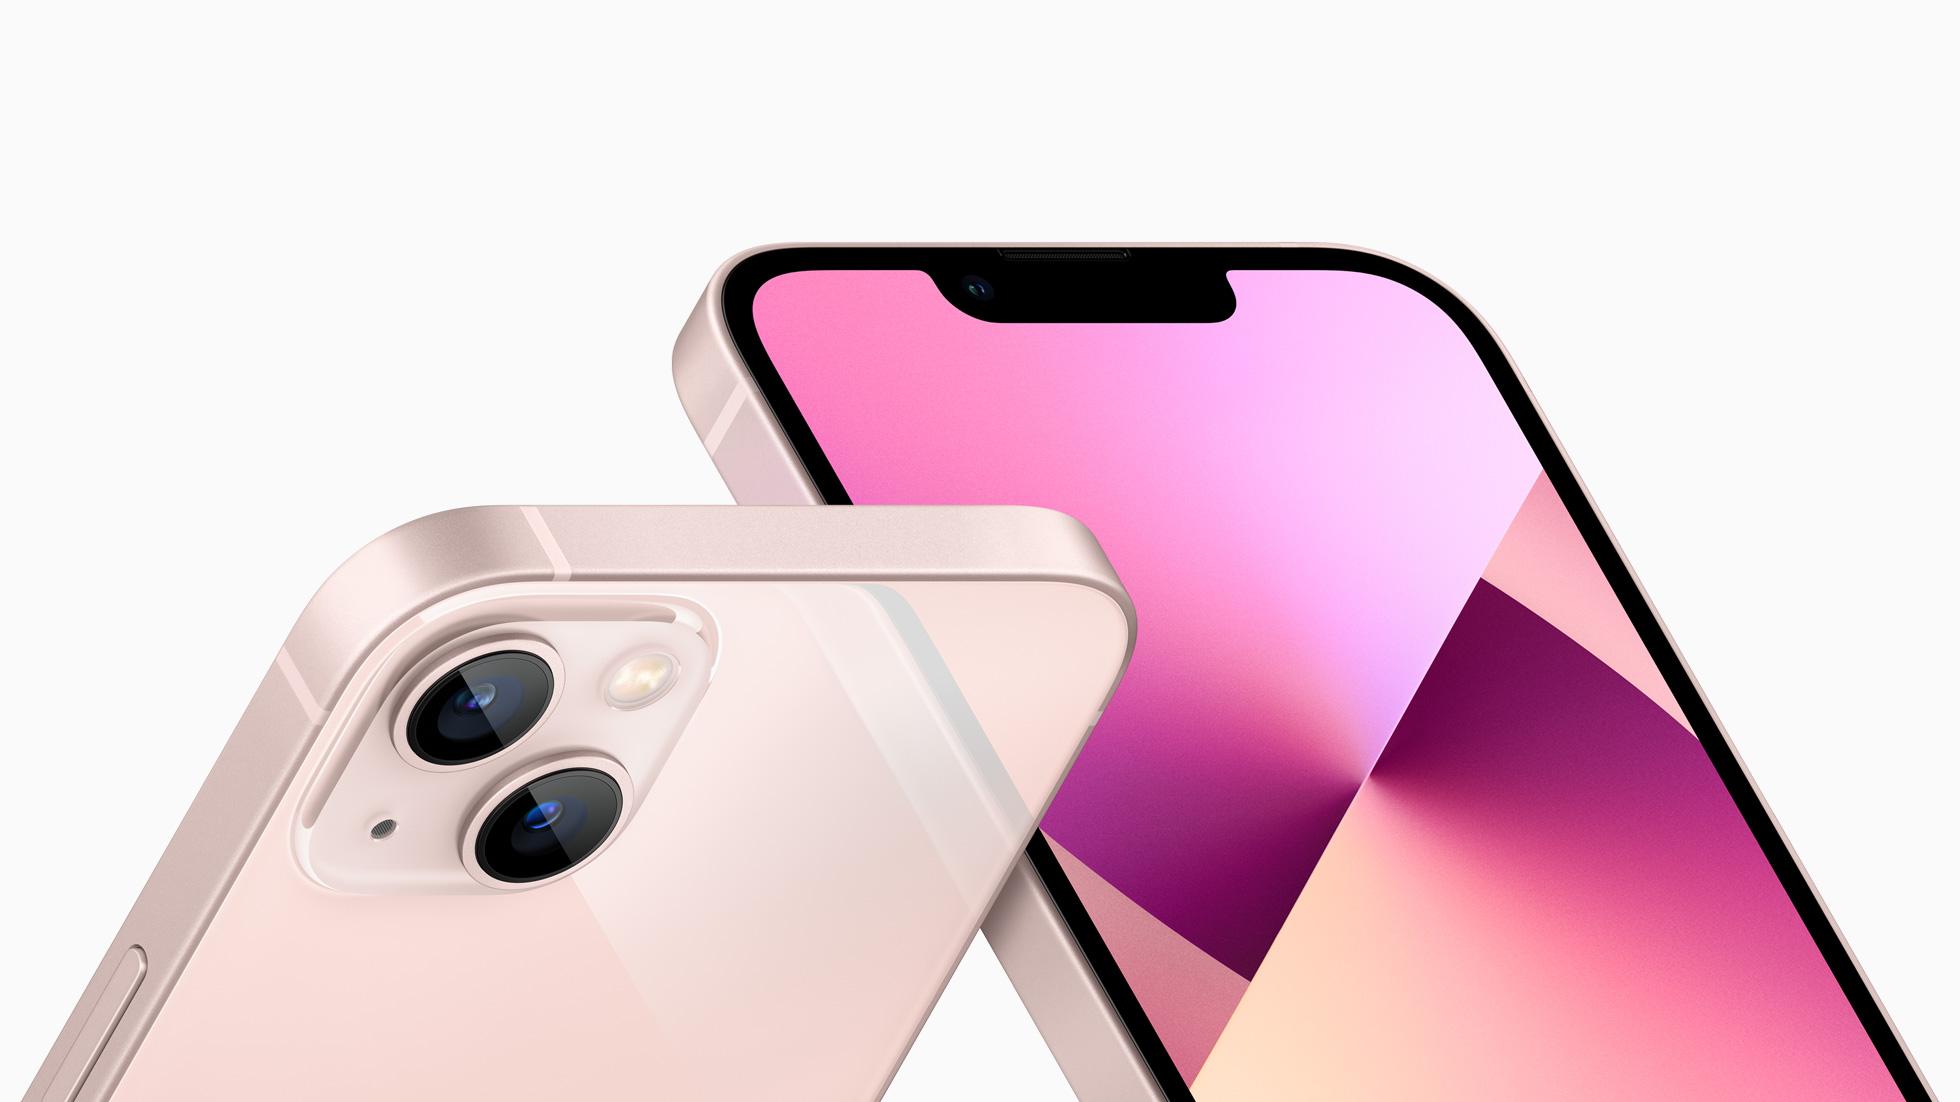 Apple_iphone13_design_09142021.jpg